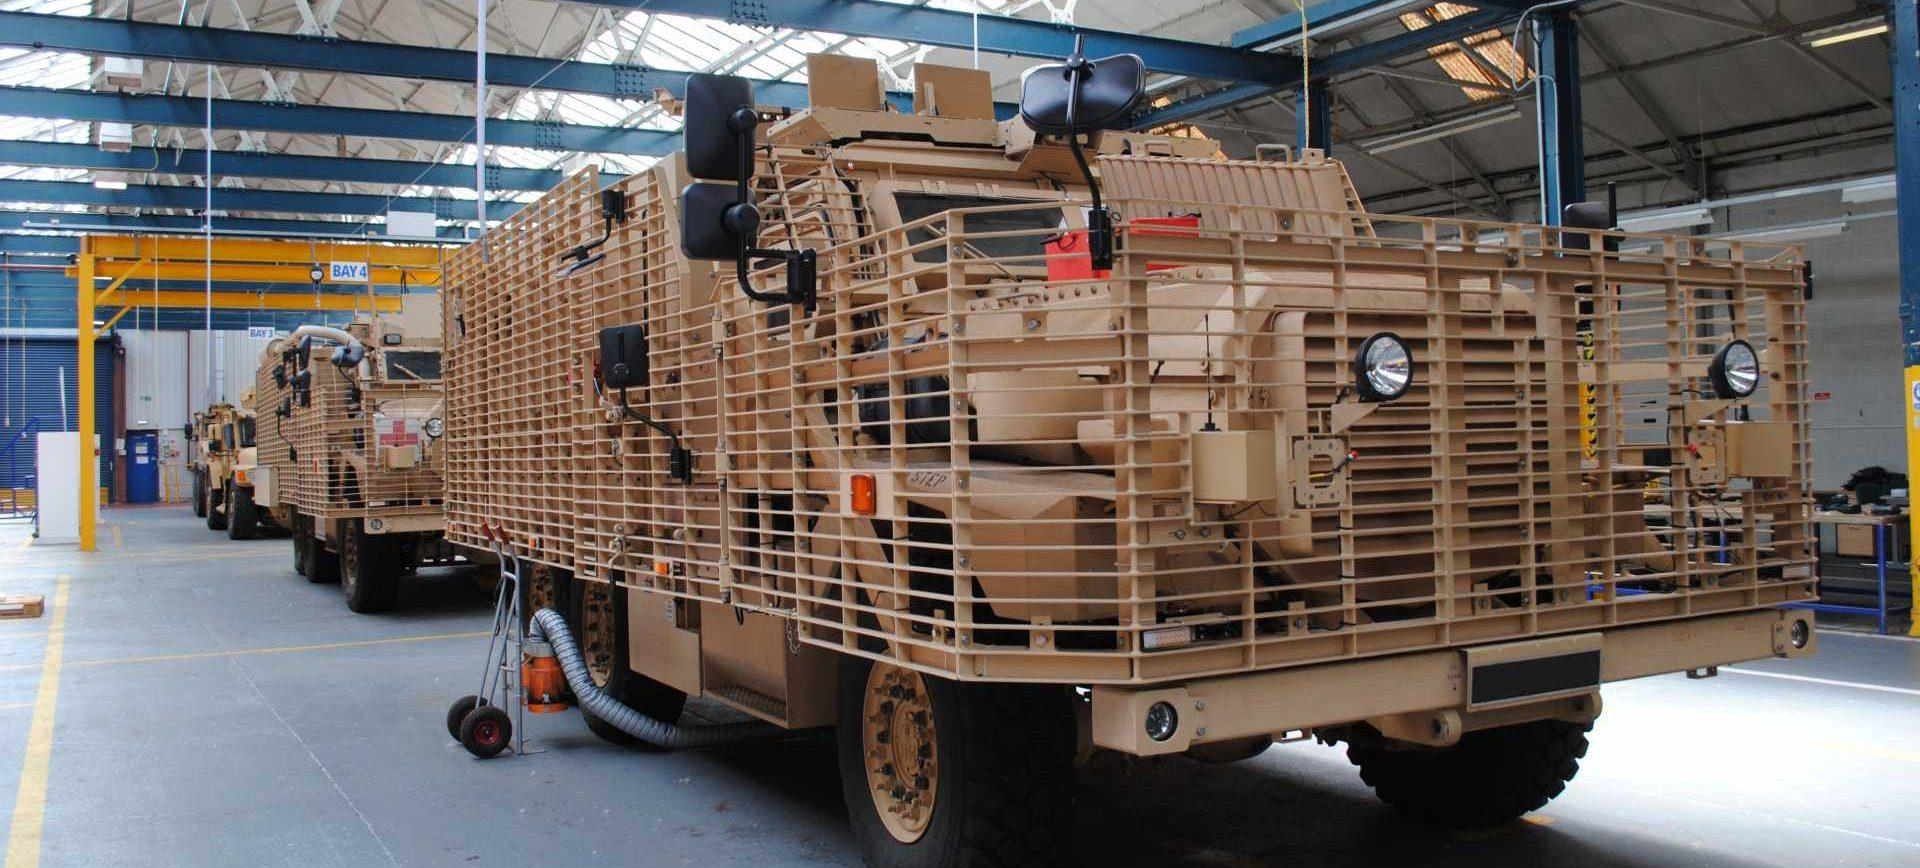 vehicle np aerospace defence - mw